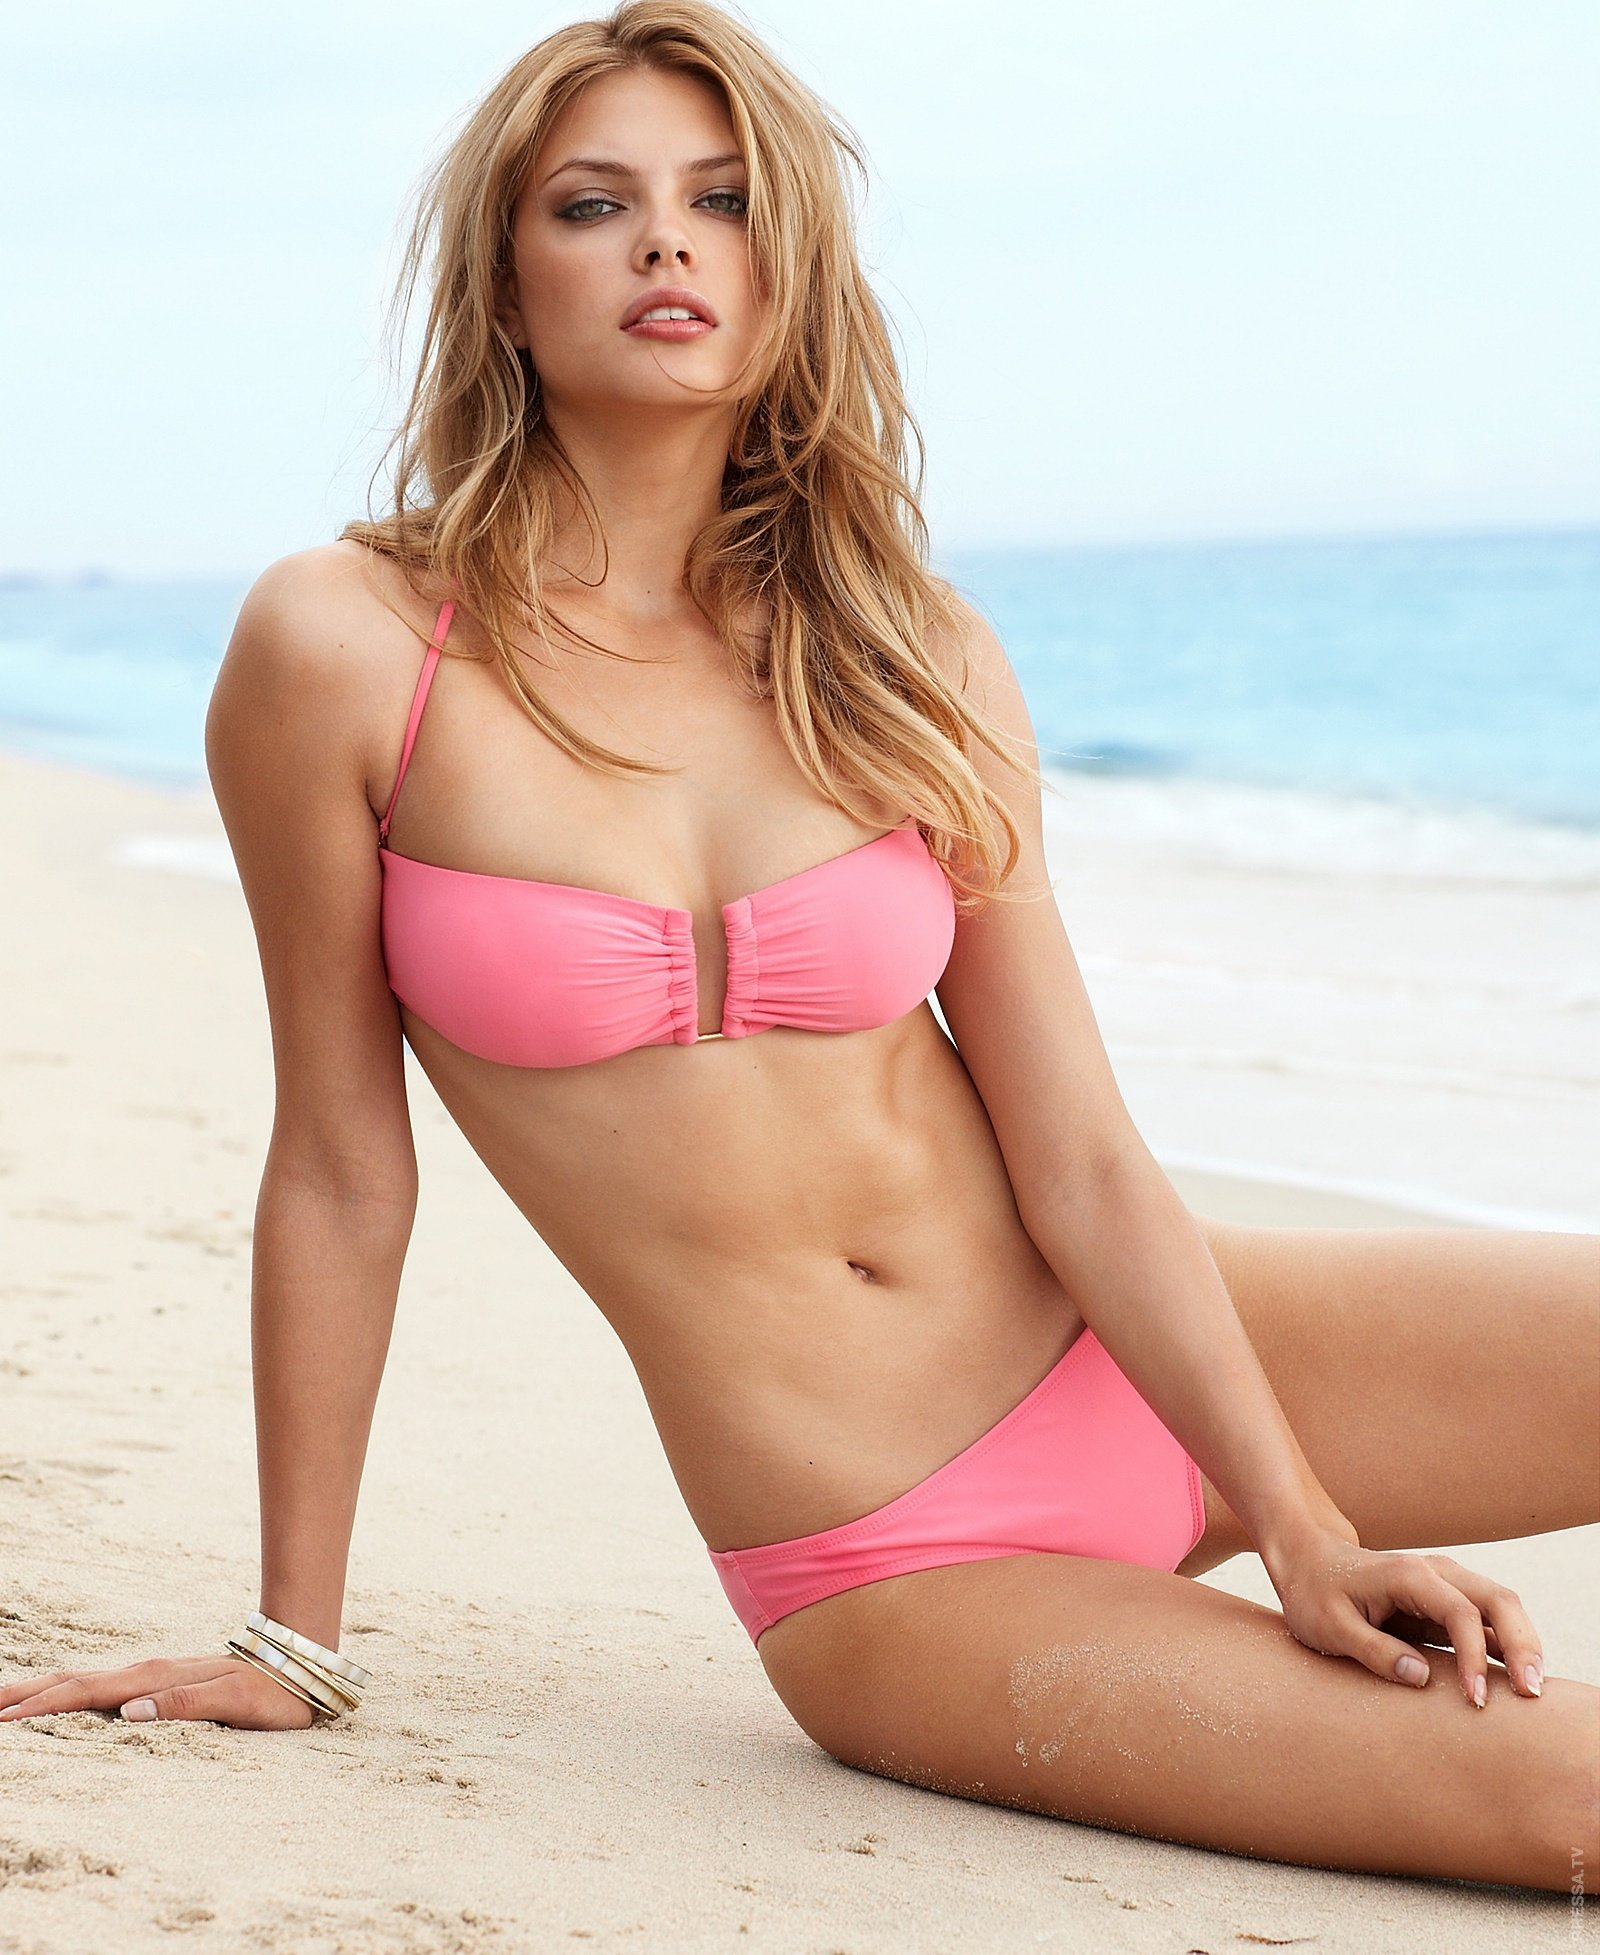 Bikini model picture galleries, bottomless bikini contest